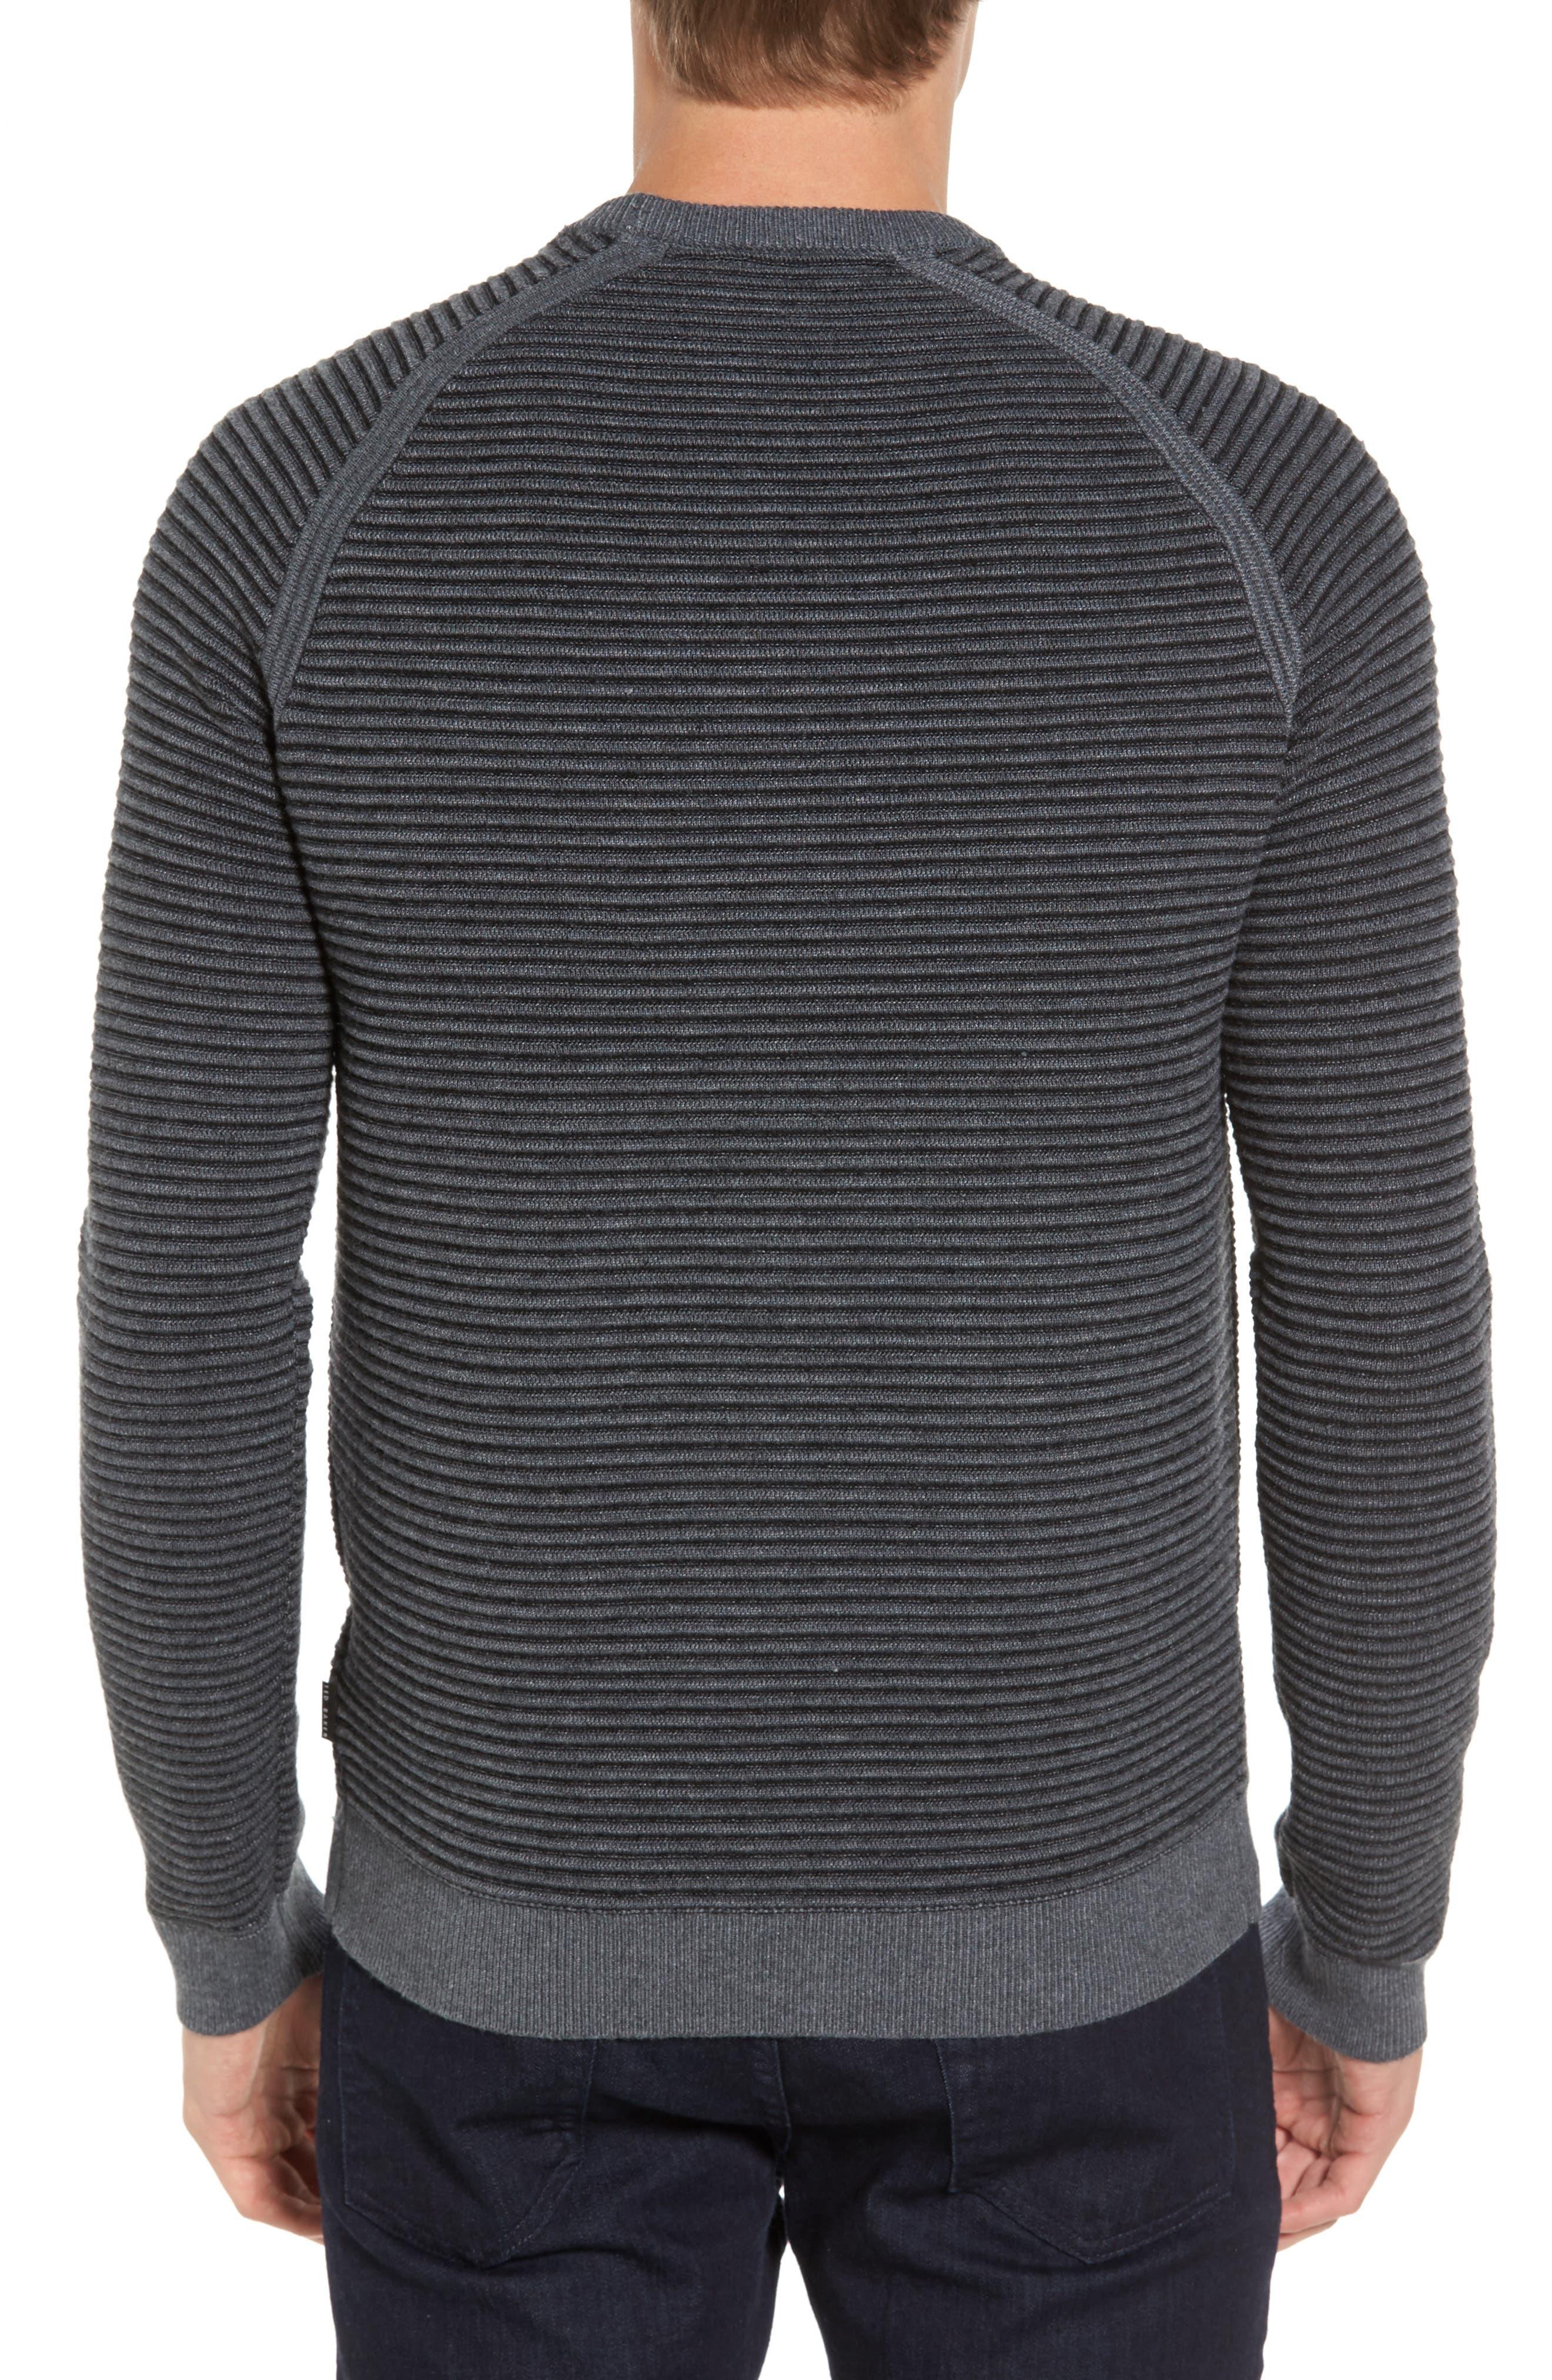 Cashoo Slim Fit Ribbed Sweatshirt,                             Alternate thumbnail 2, color,                             030